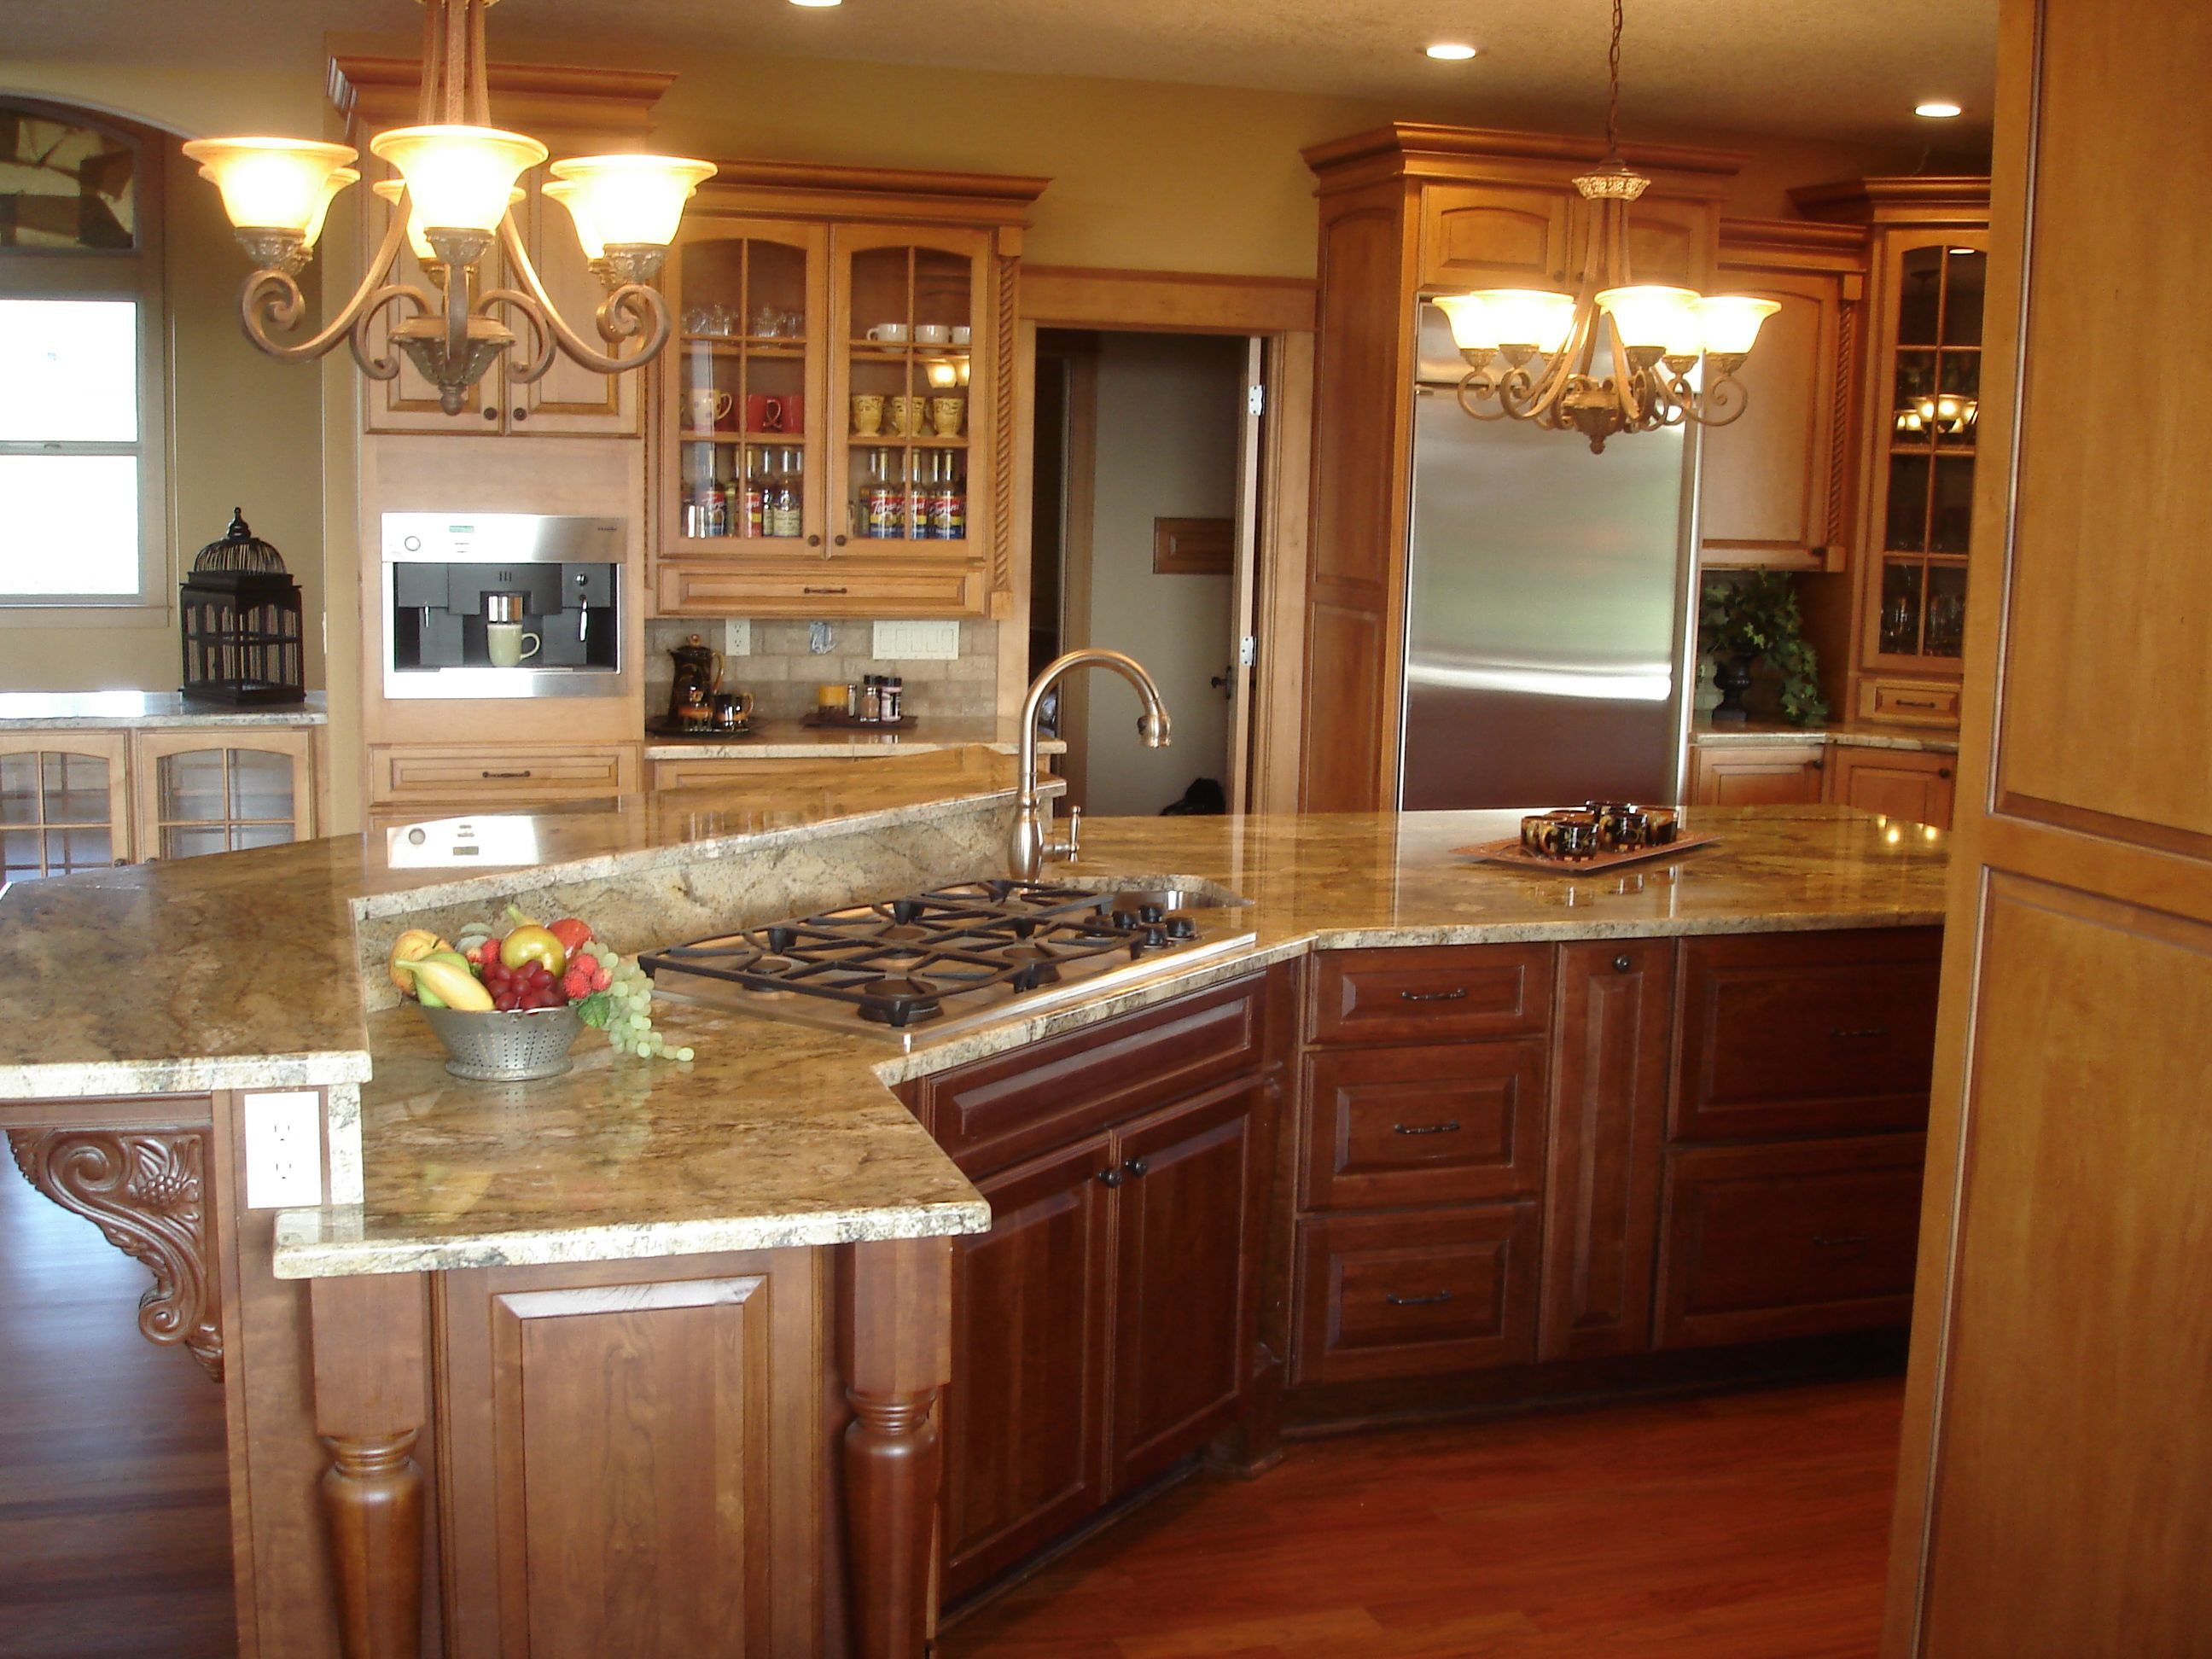 beautiful kitchen island kitchen beautiful kitchens house design on kitchen ideas with island id=88398